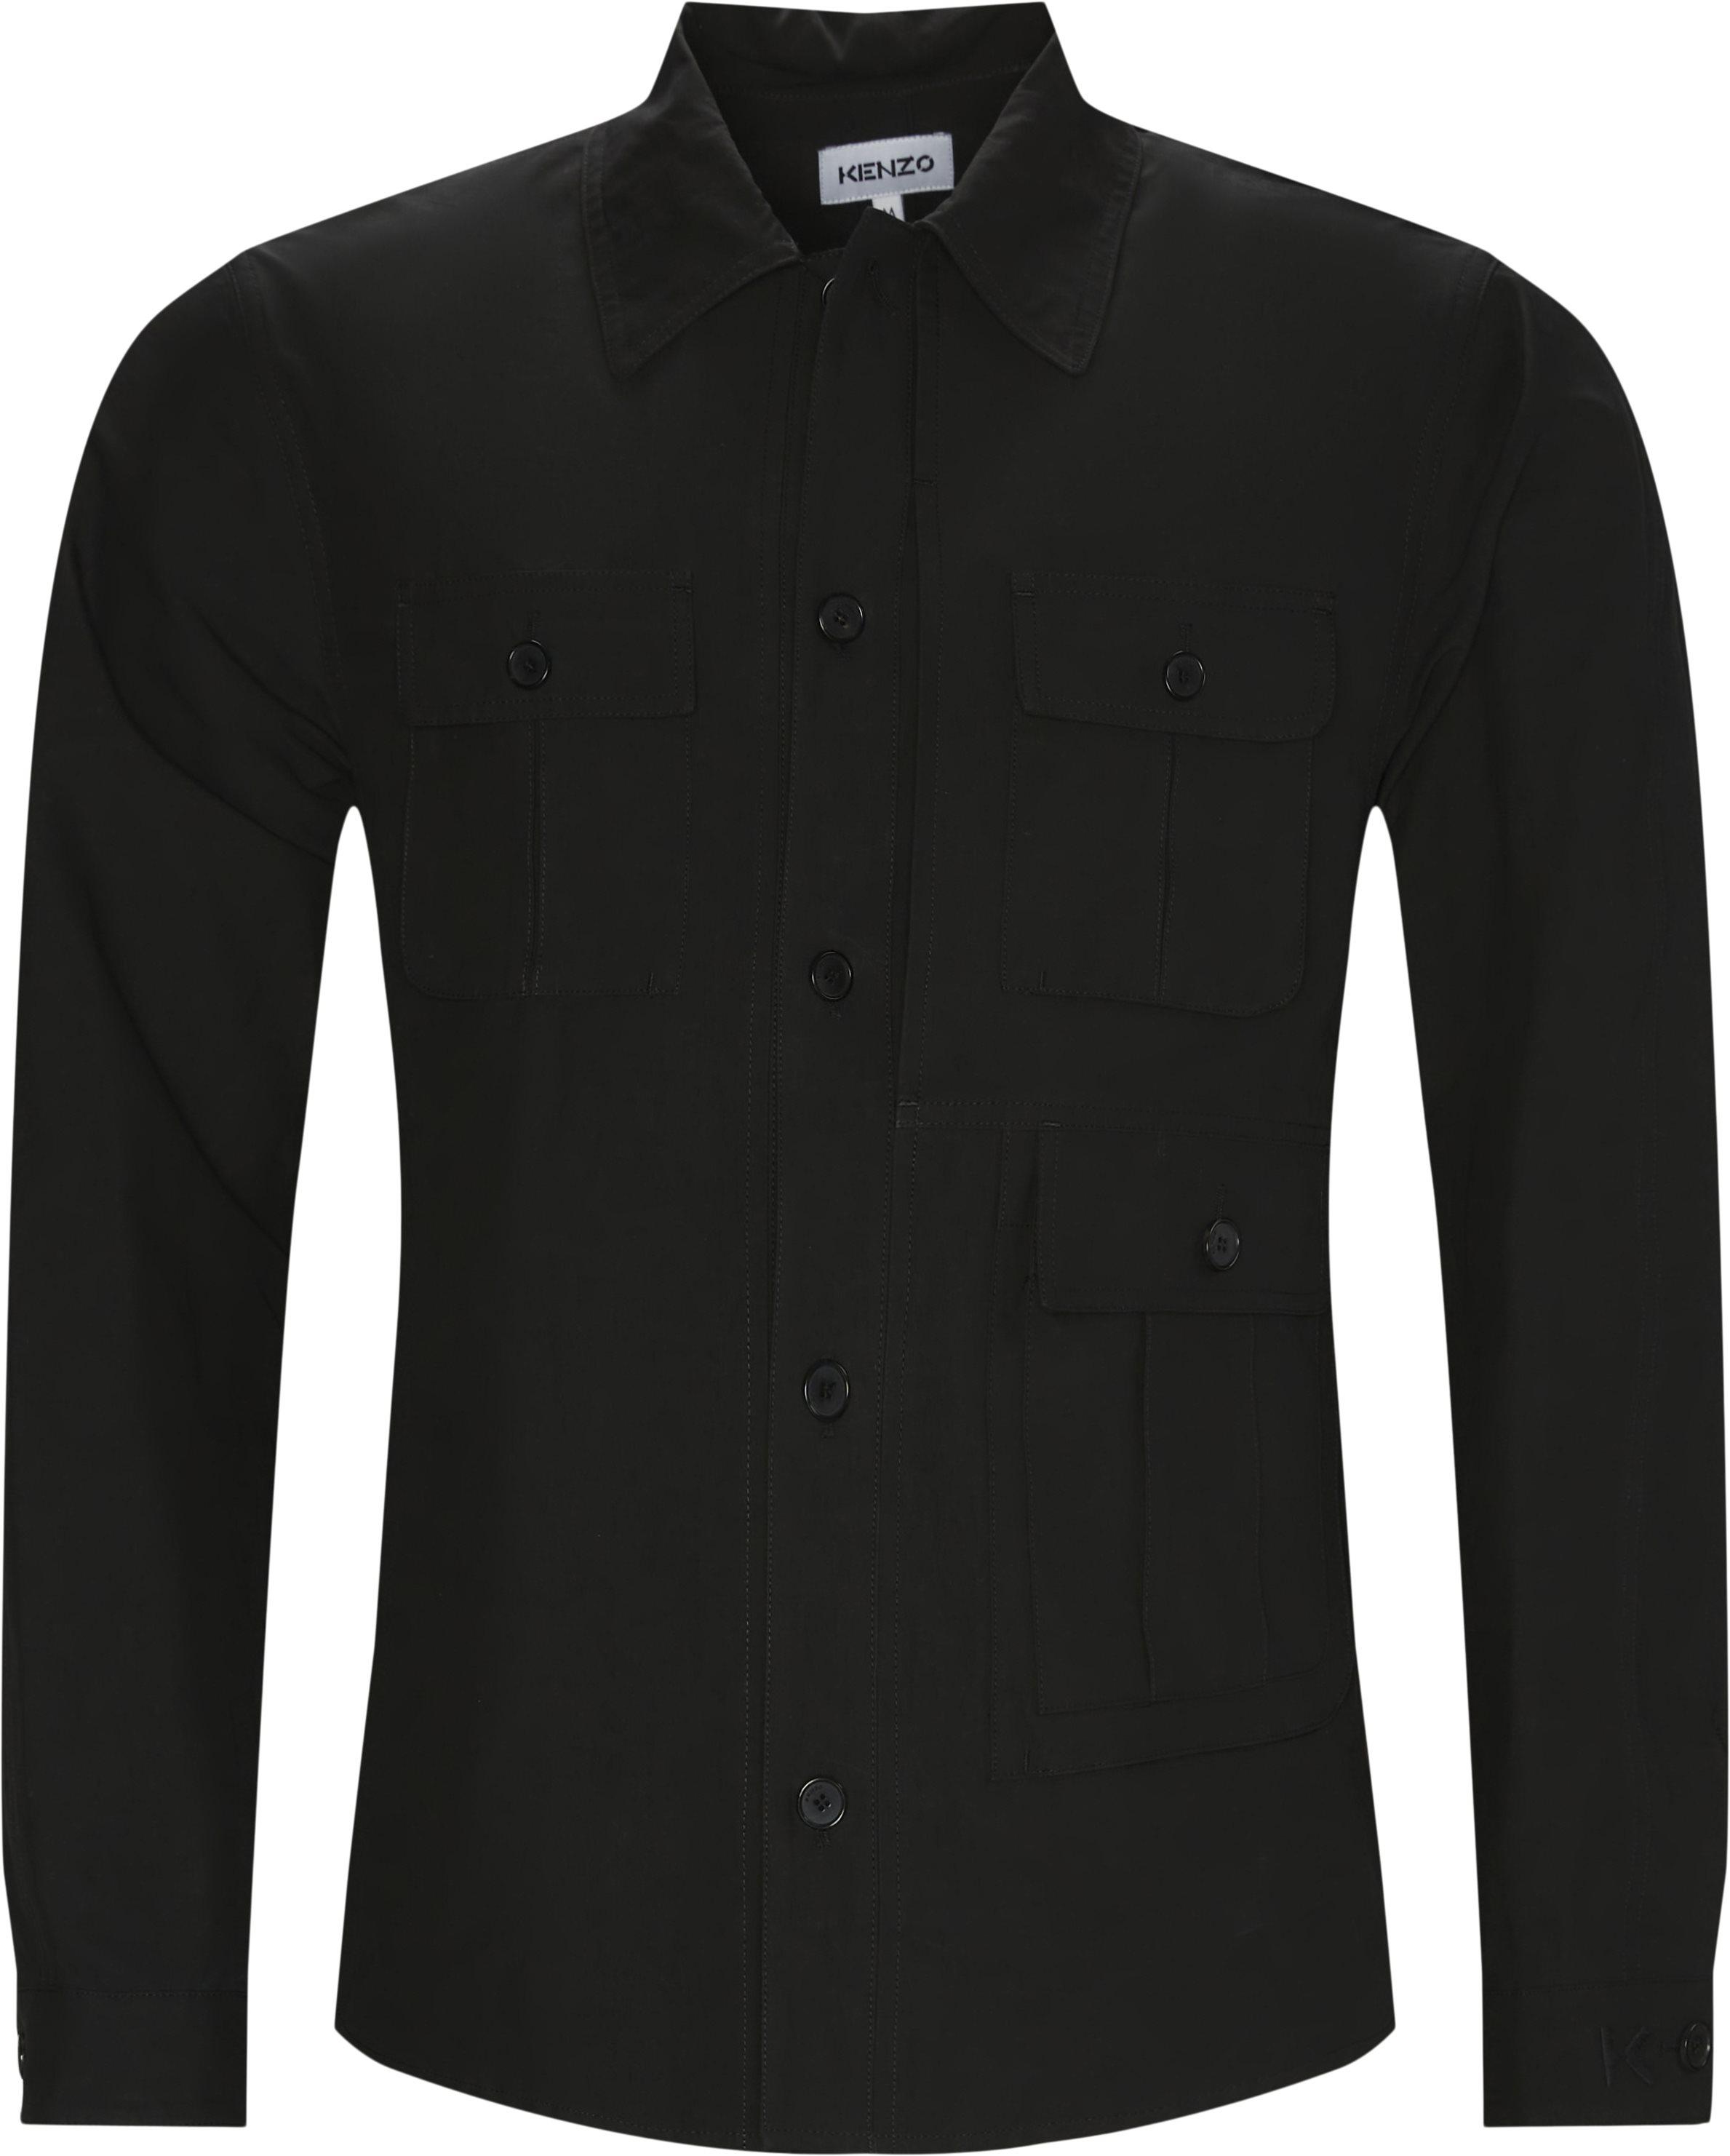 Utilitarian Overshirt - Skjorter - Regular fit - Sort